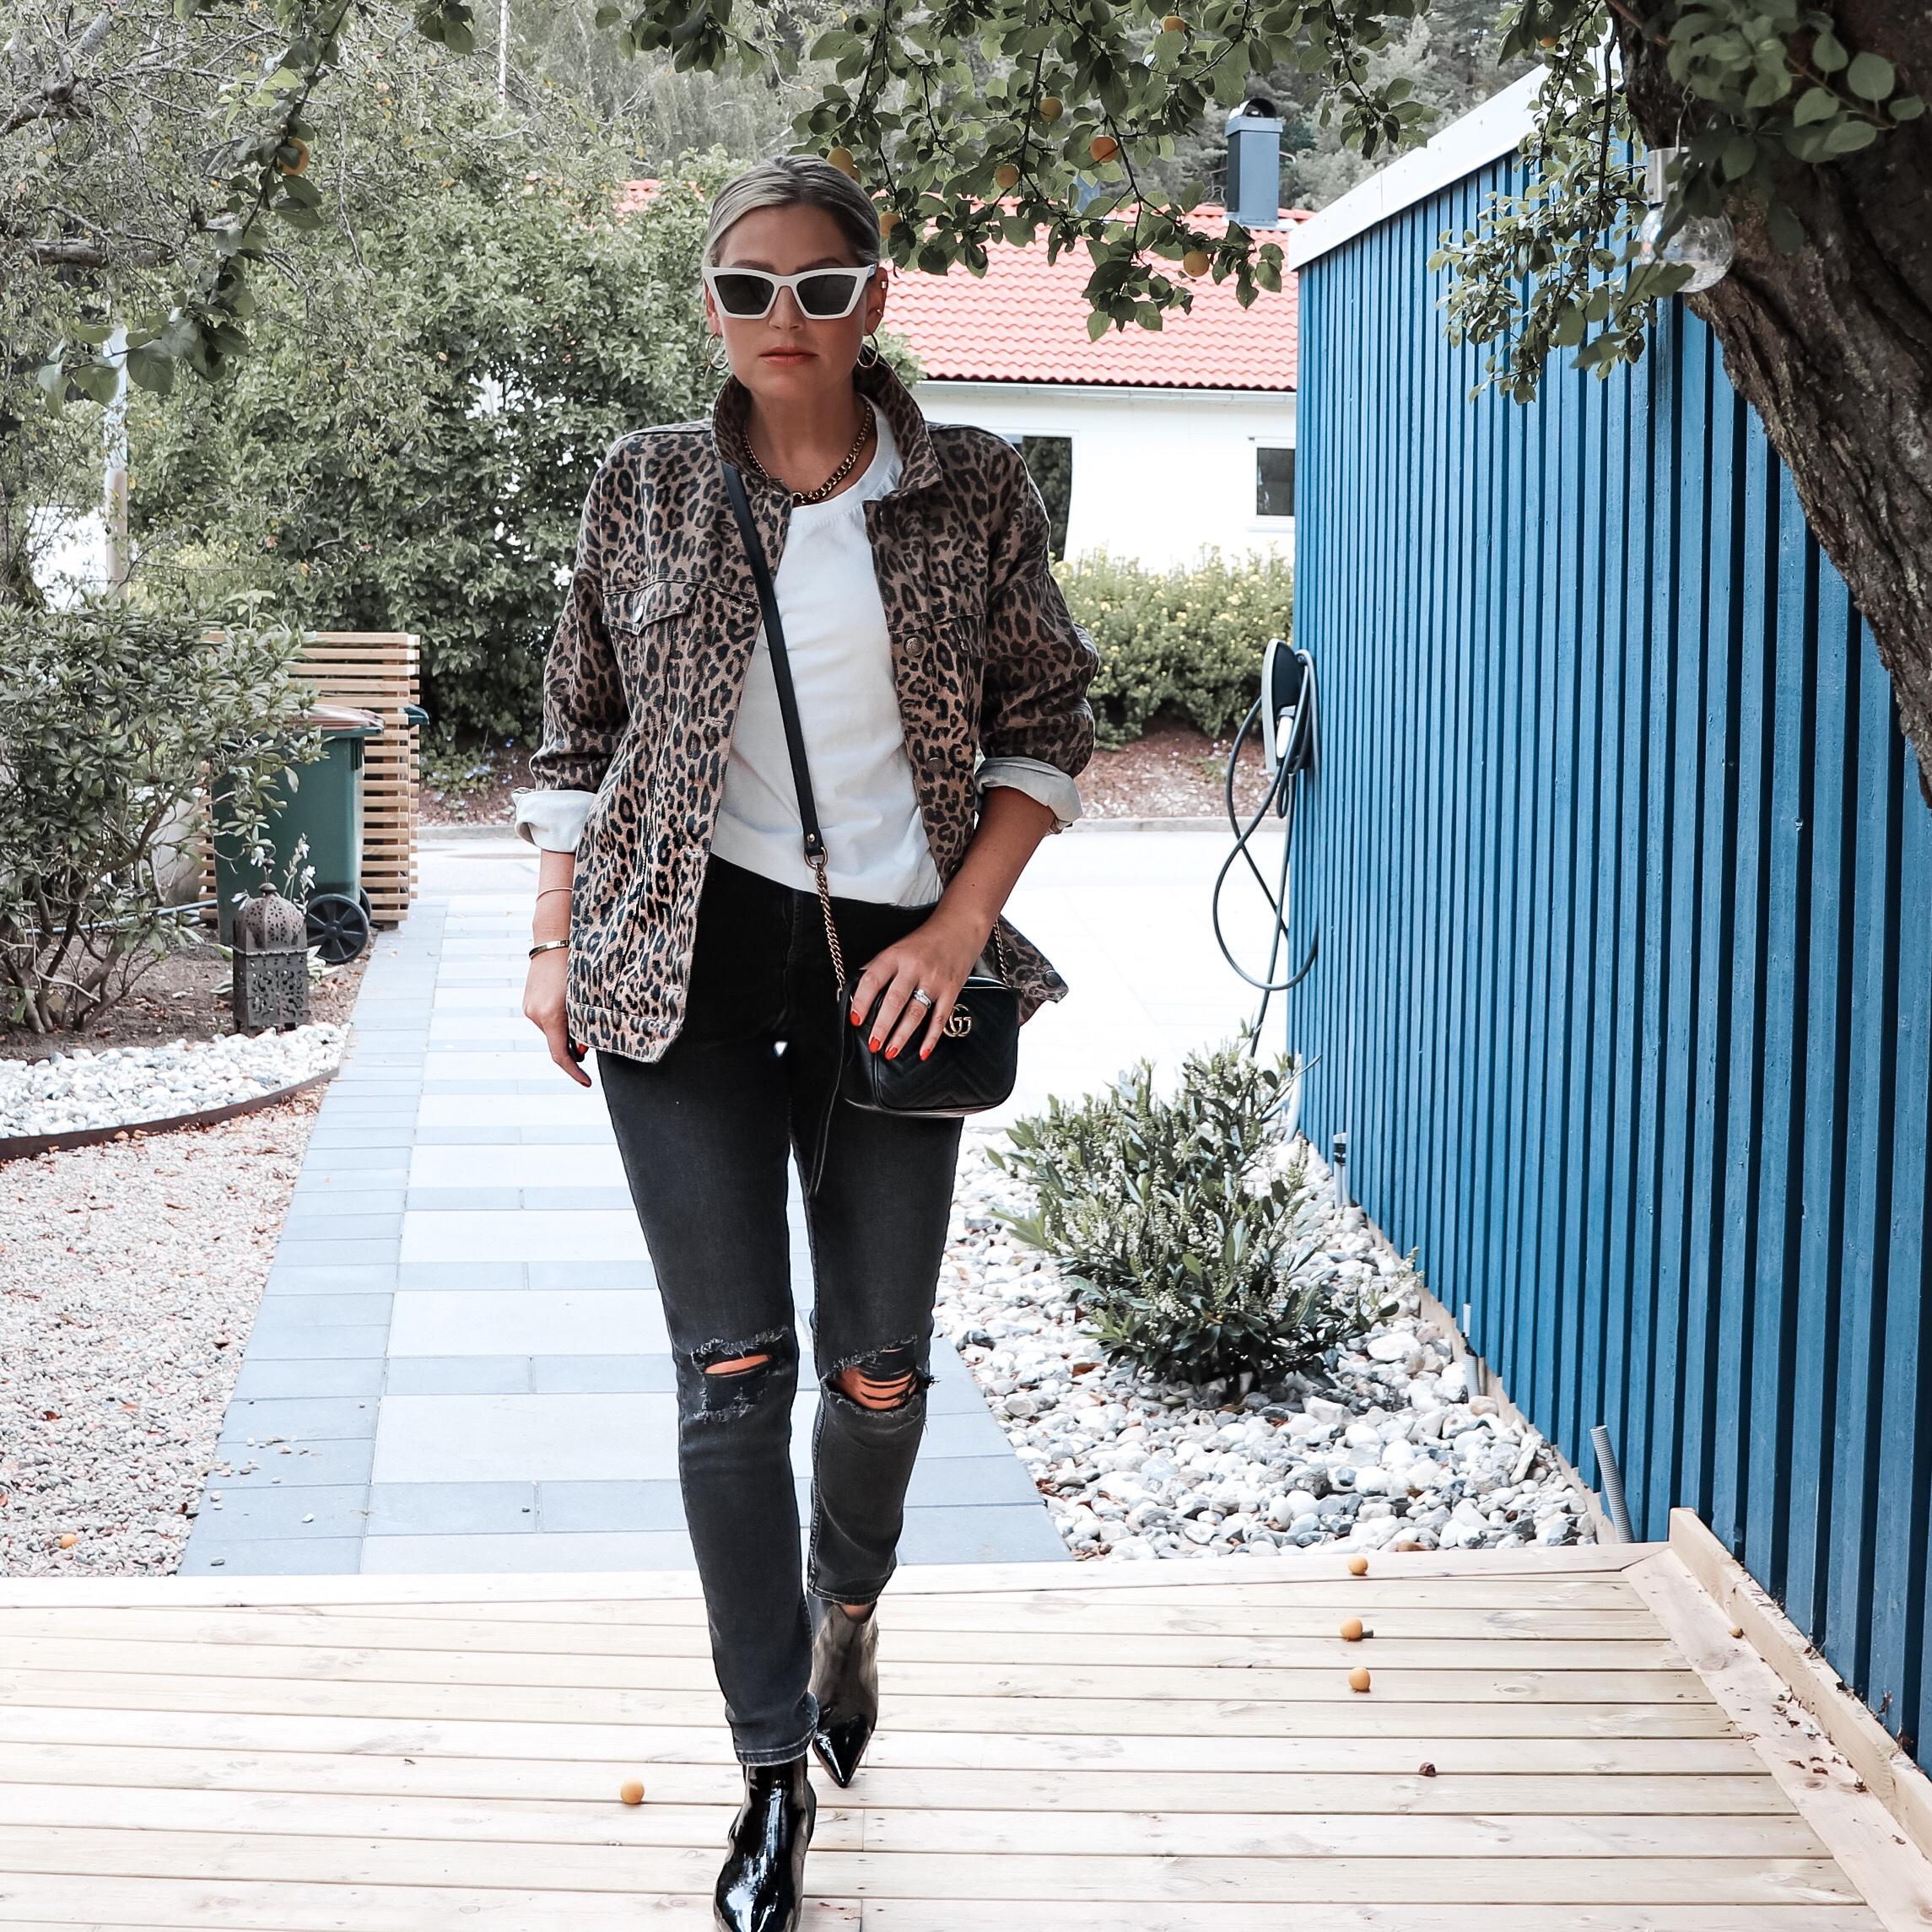 Leopardjacka, leopardmönstrad jacka, jeansjacka, denimjacka, dagens outfit, Göteborg